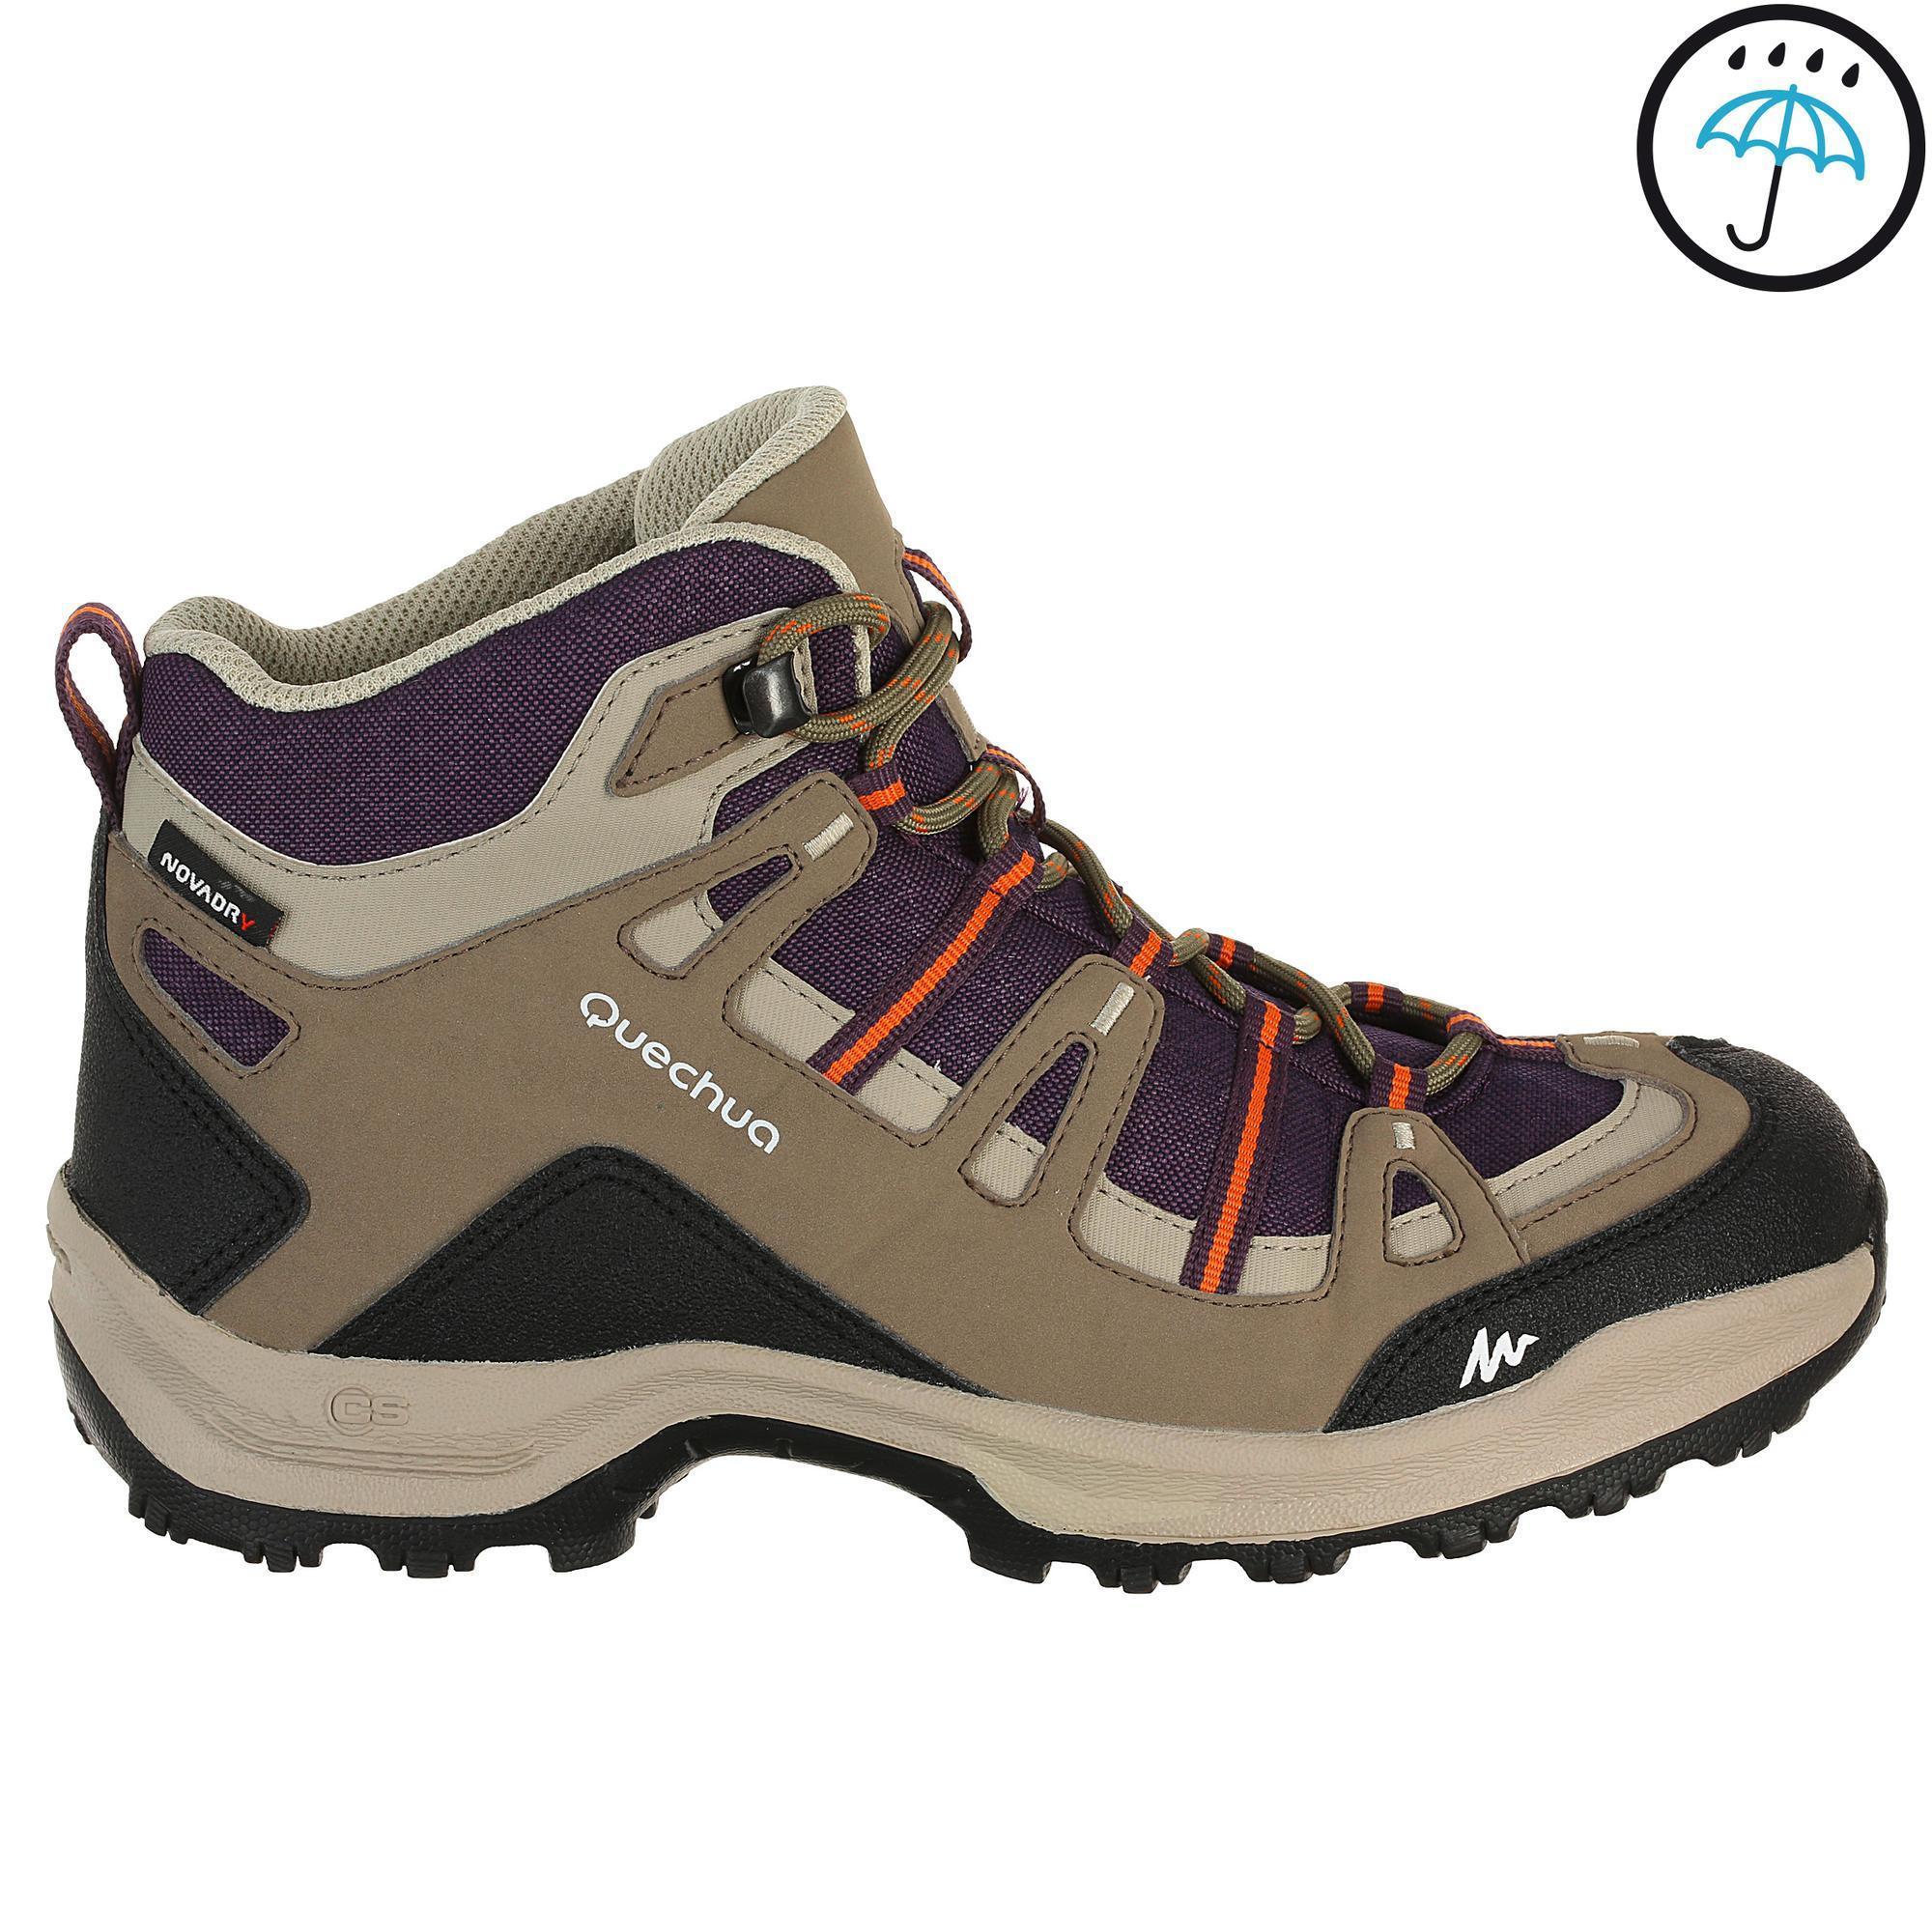 Chaussure Marche Quechua Chaussure Randonn茅e Quechua Arpenaz 500